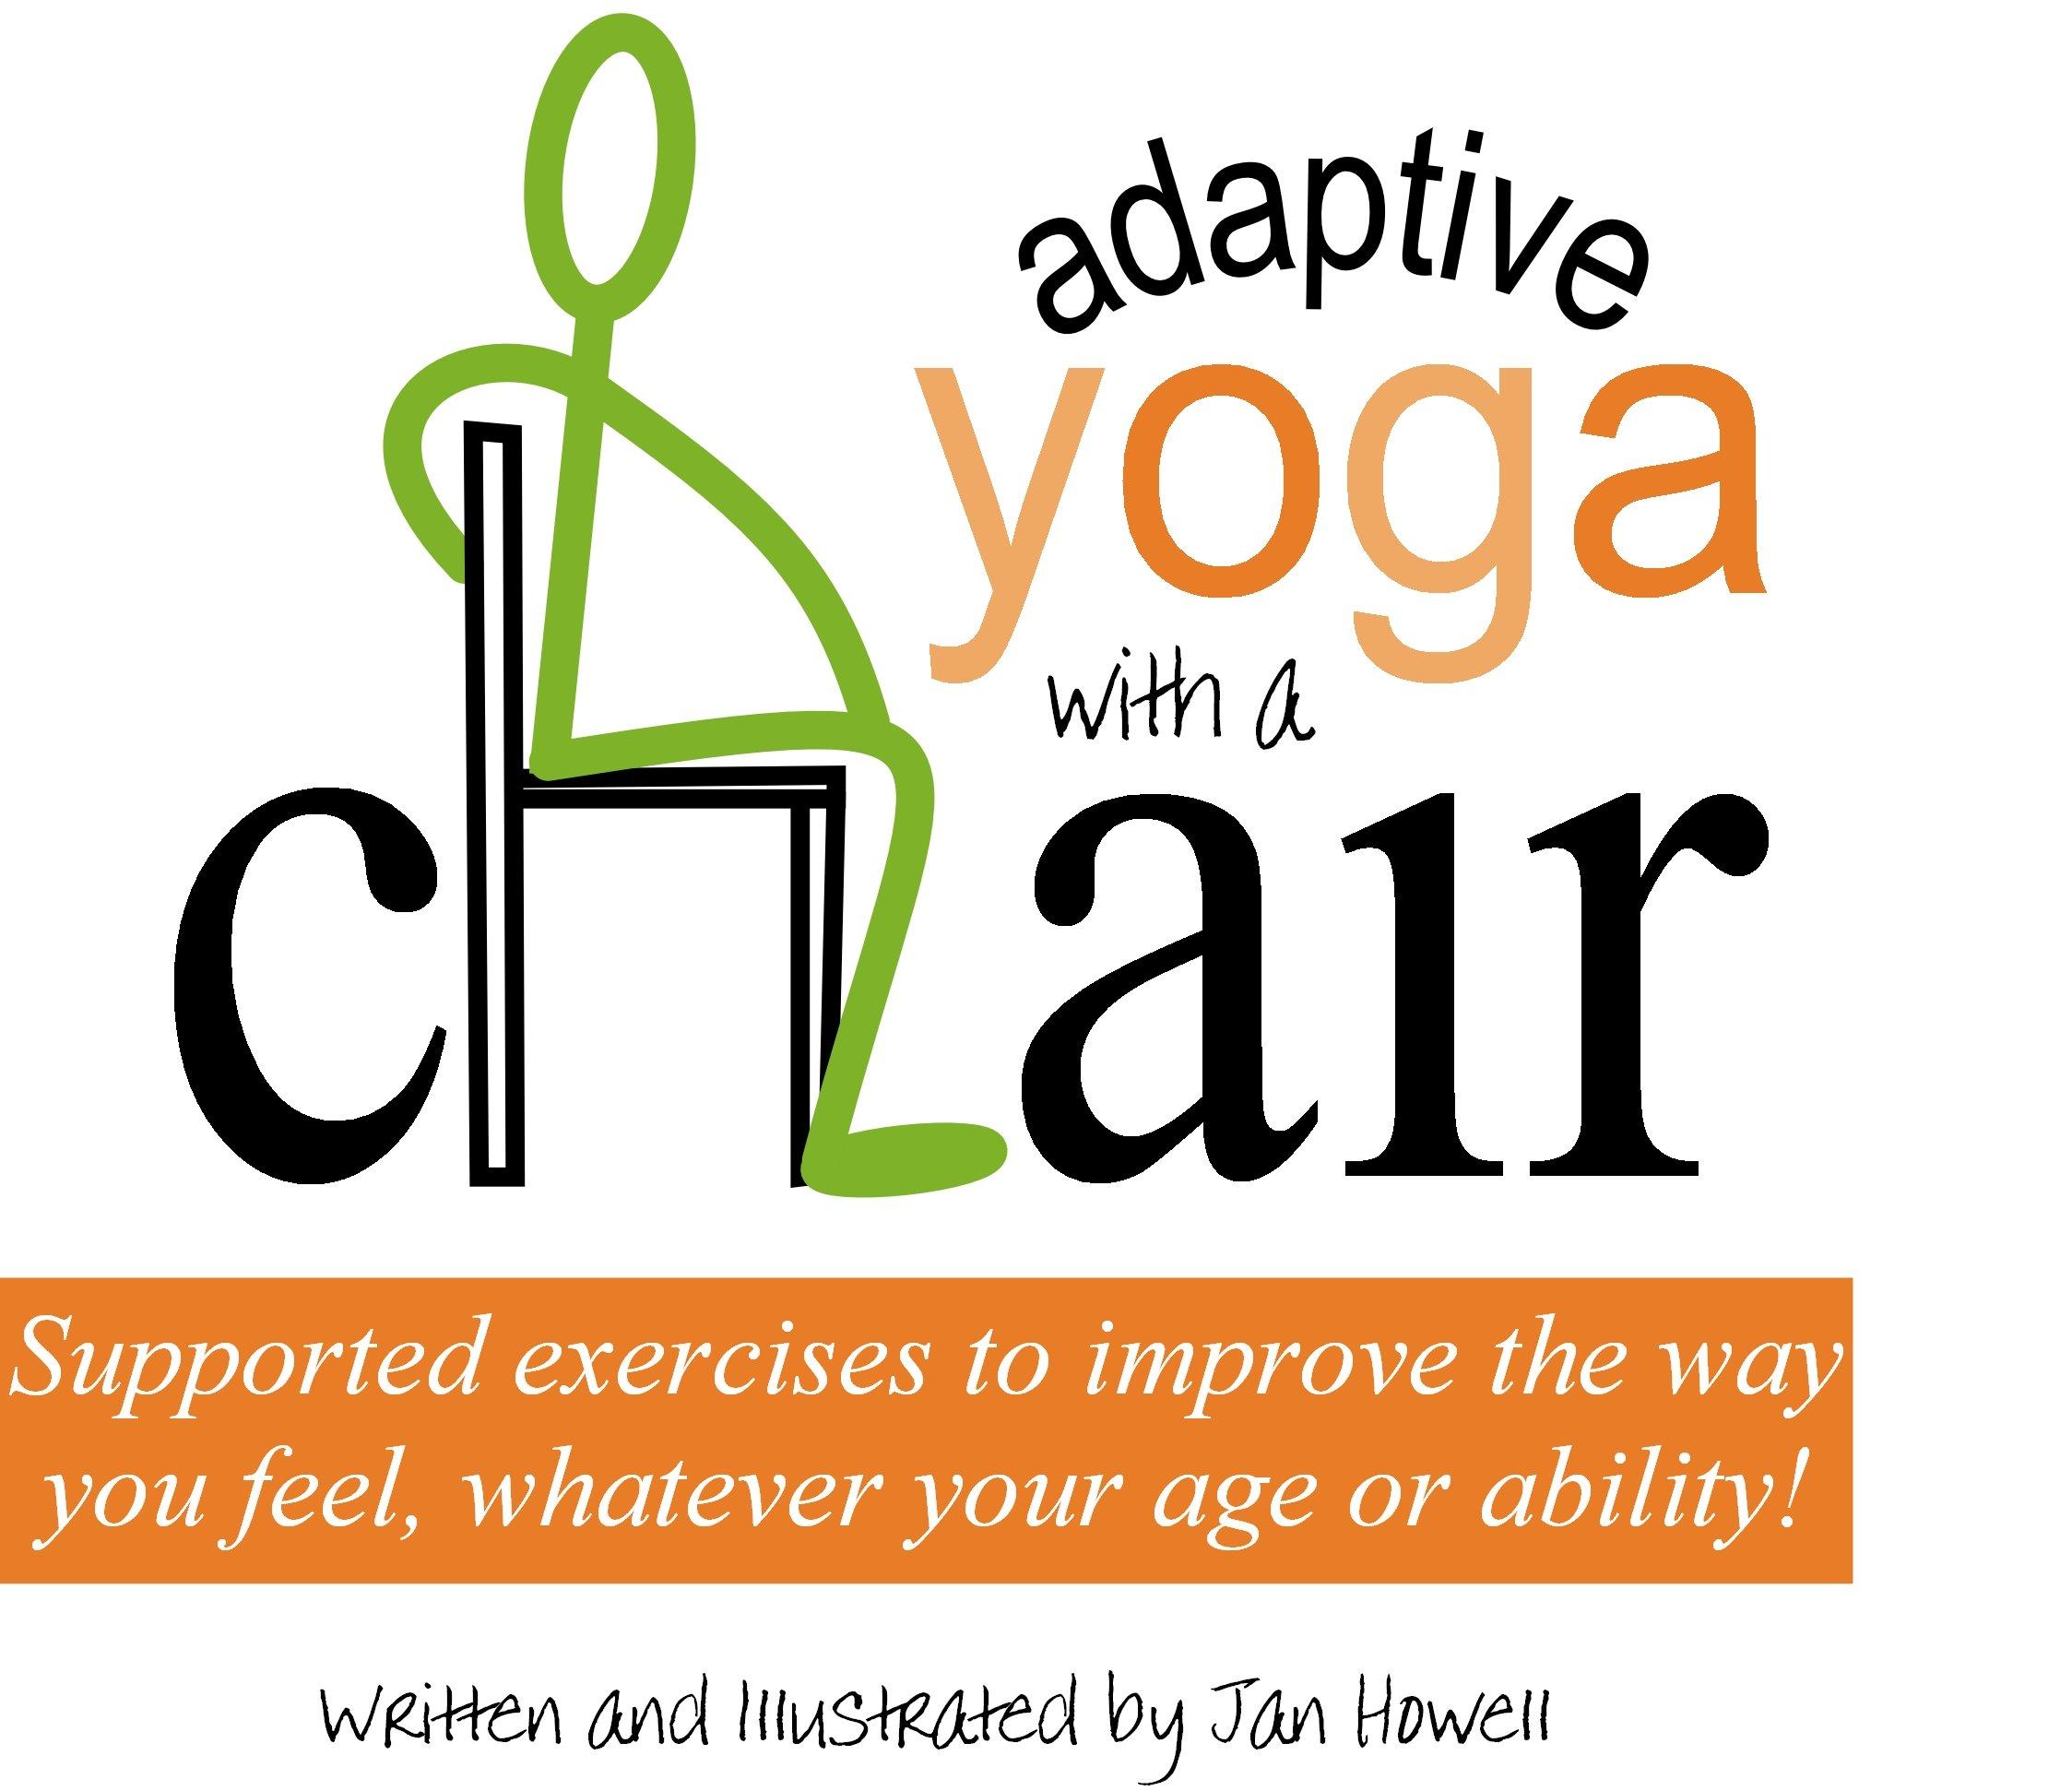 Adaptive Yoga with a Chair Jan Howell Amazon